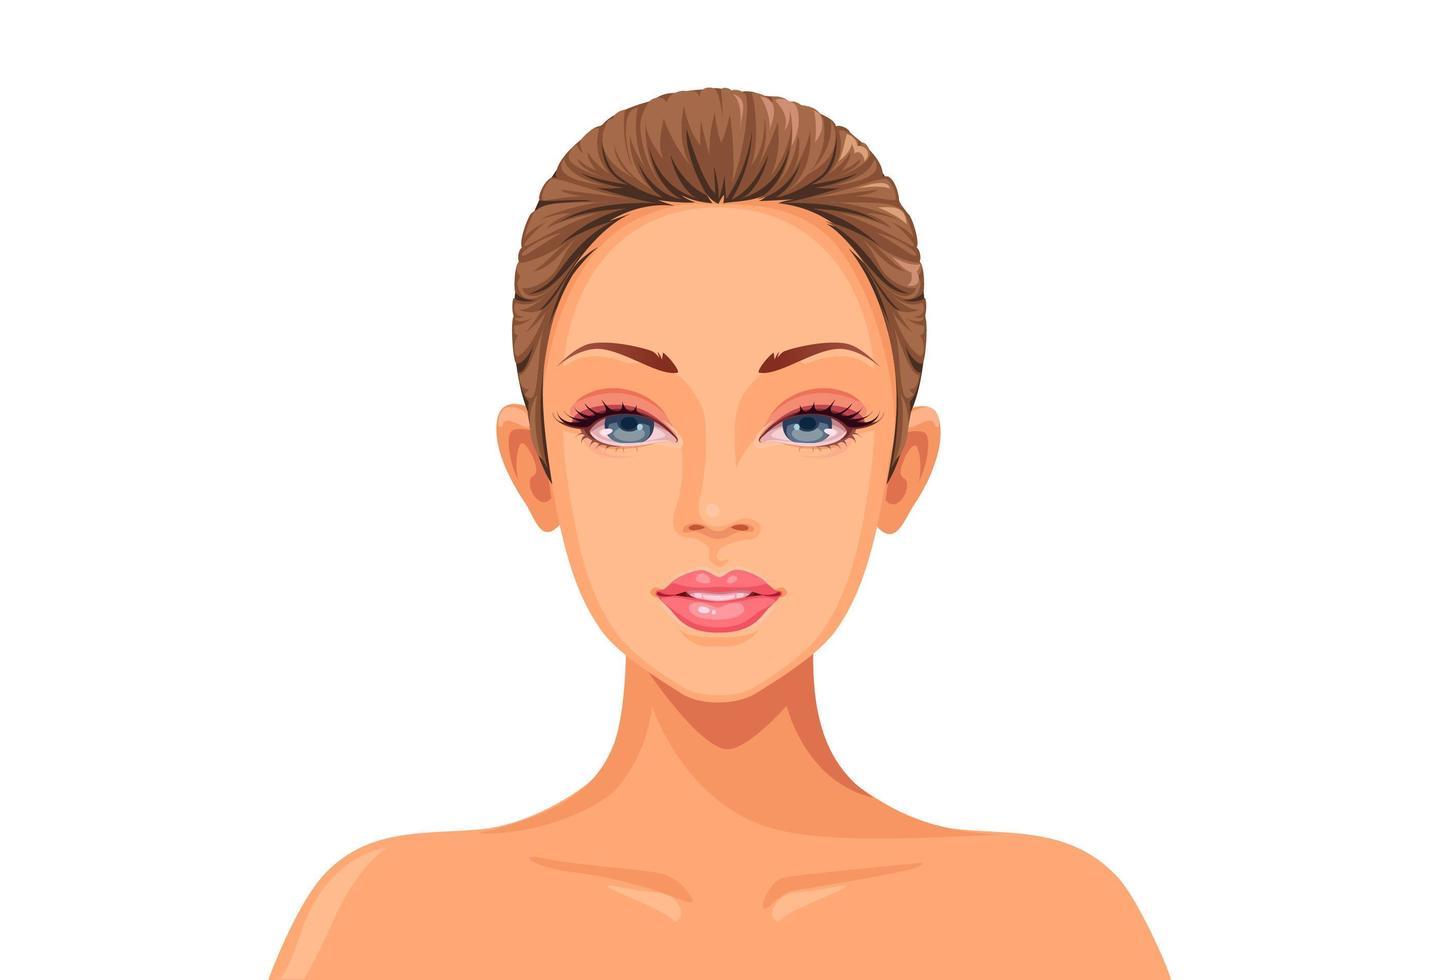 avatar de rosto de mulher vetor